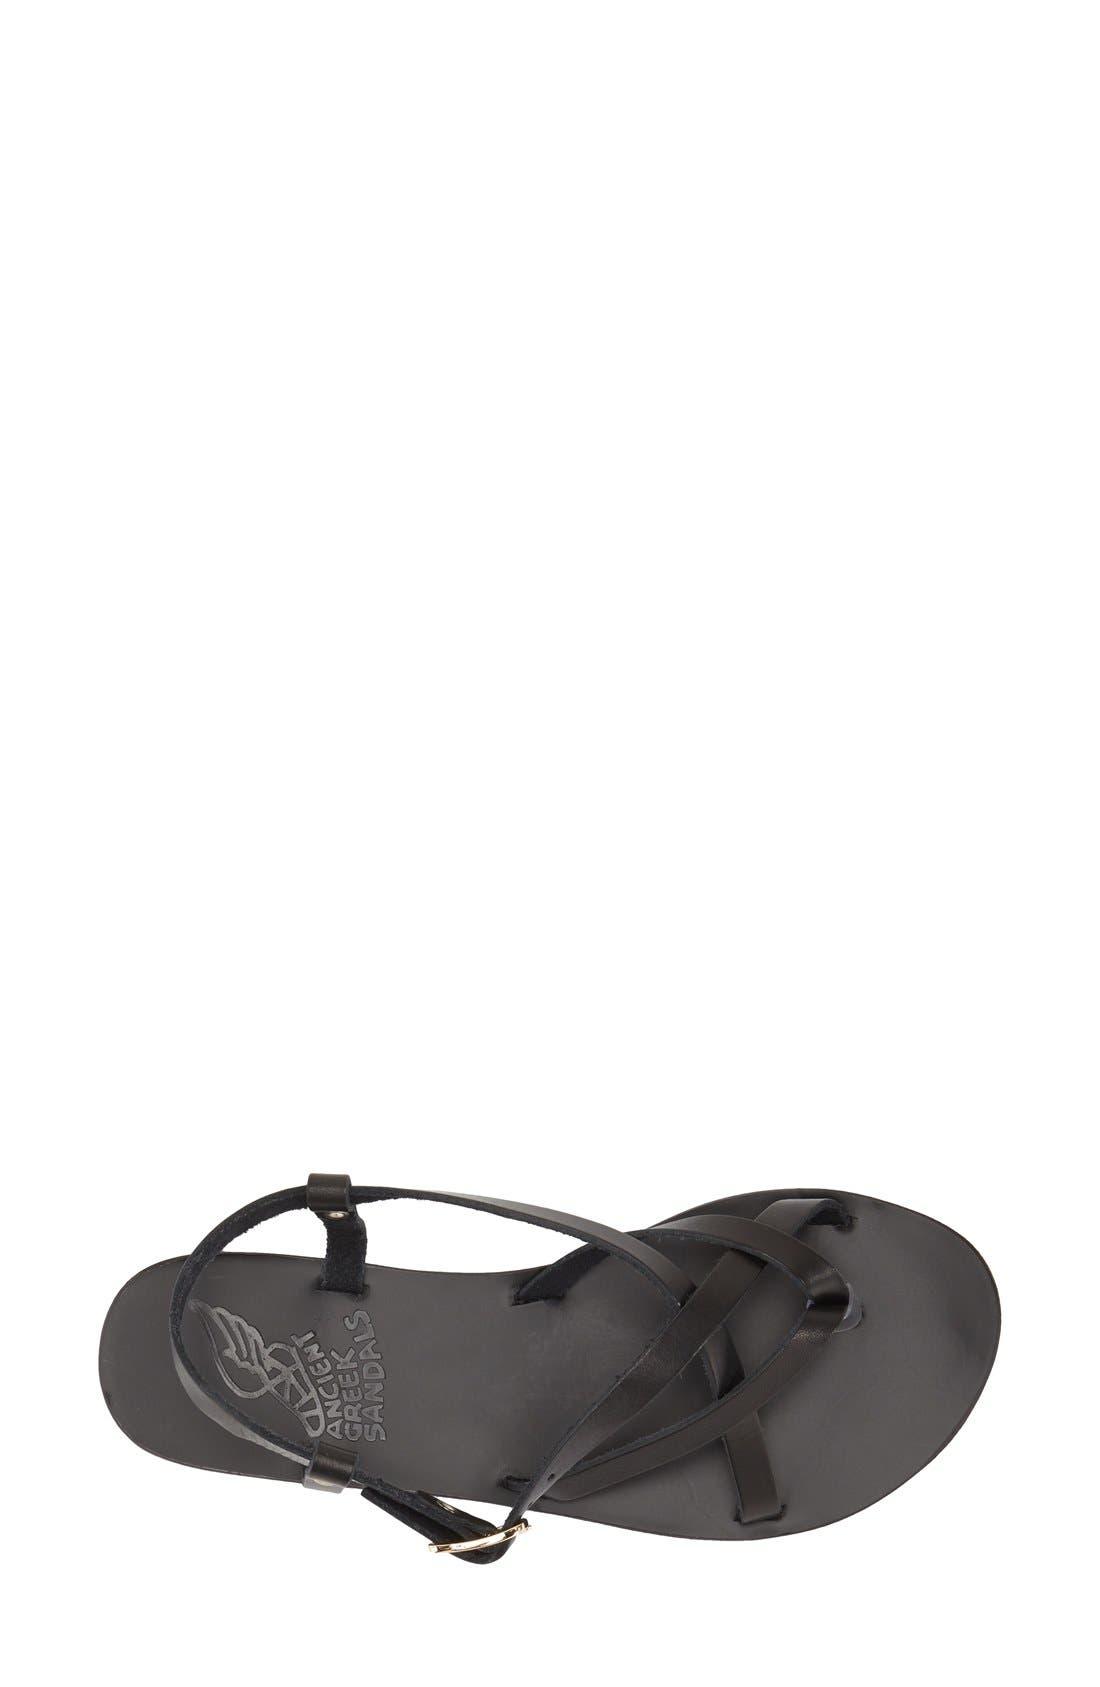 Alternate Image 3  - Ancient Greek Sandals 'Semele' Leather Sandal (Women)